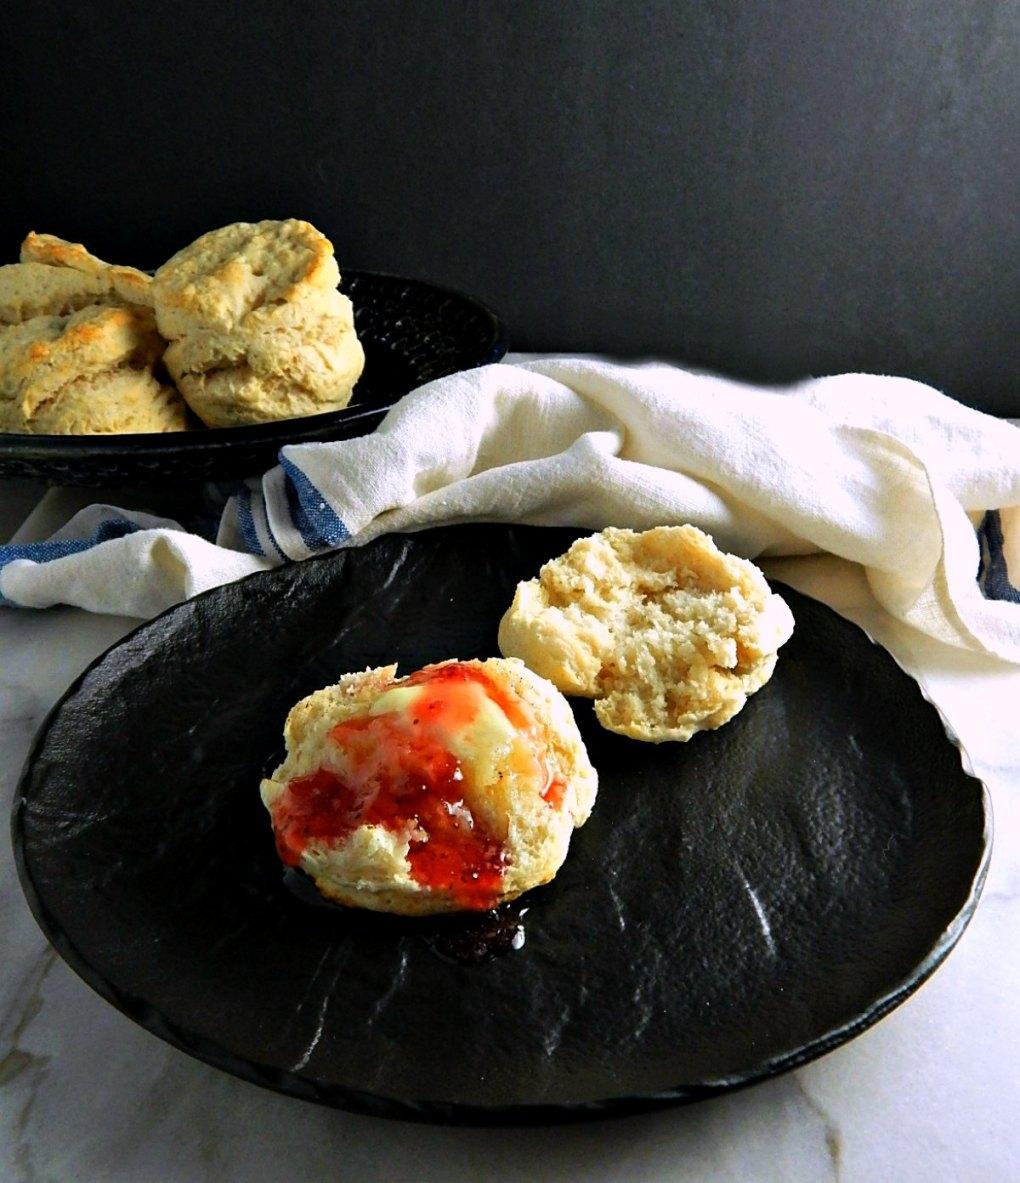 Classic Biscuits & Sausage Gravy